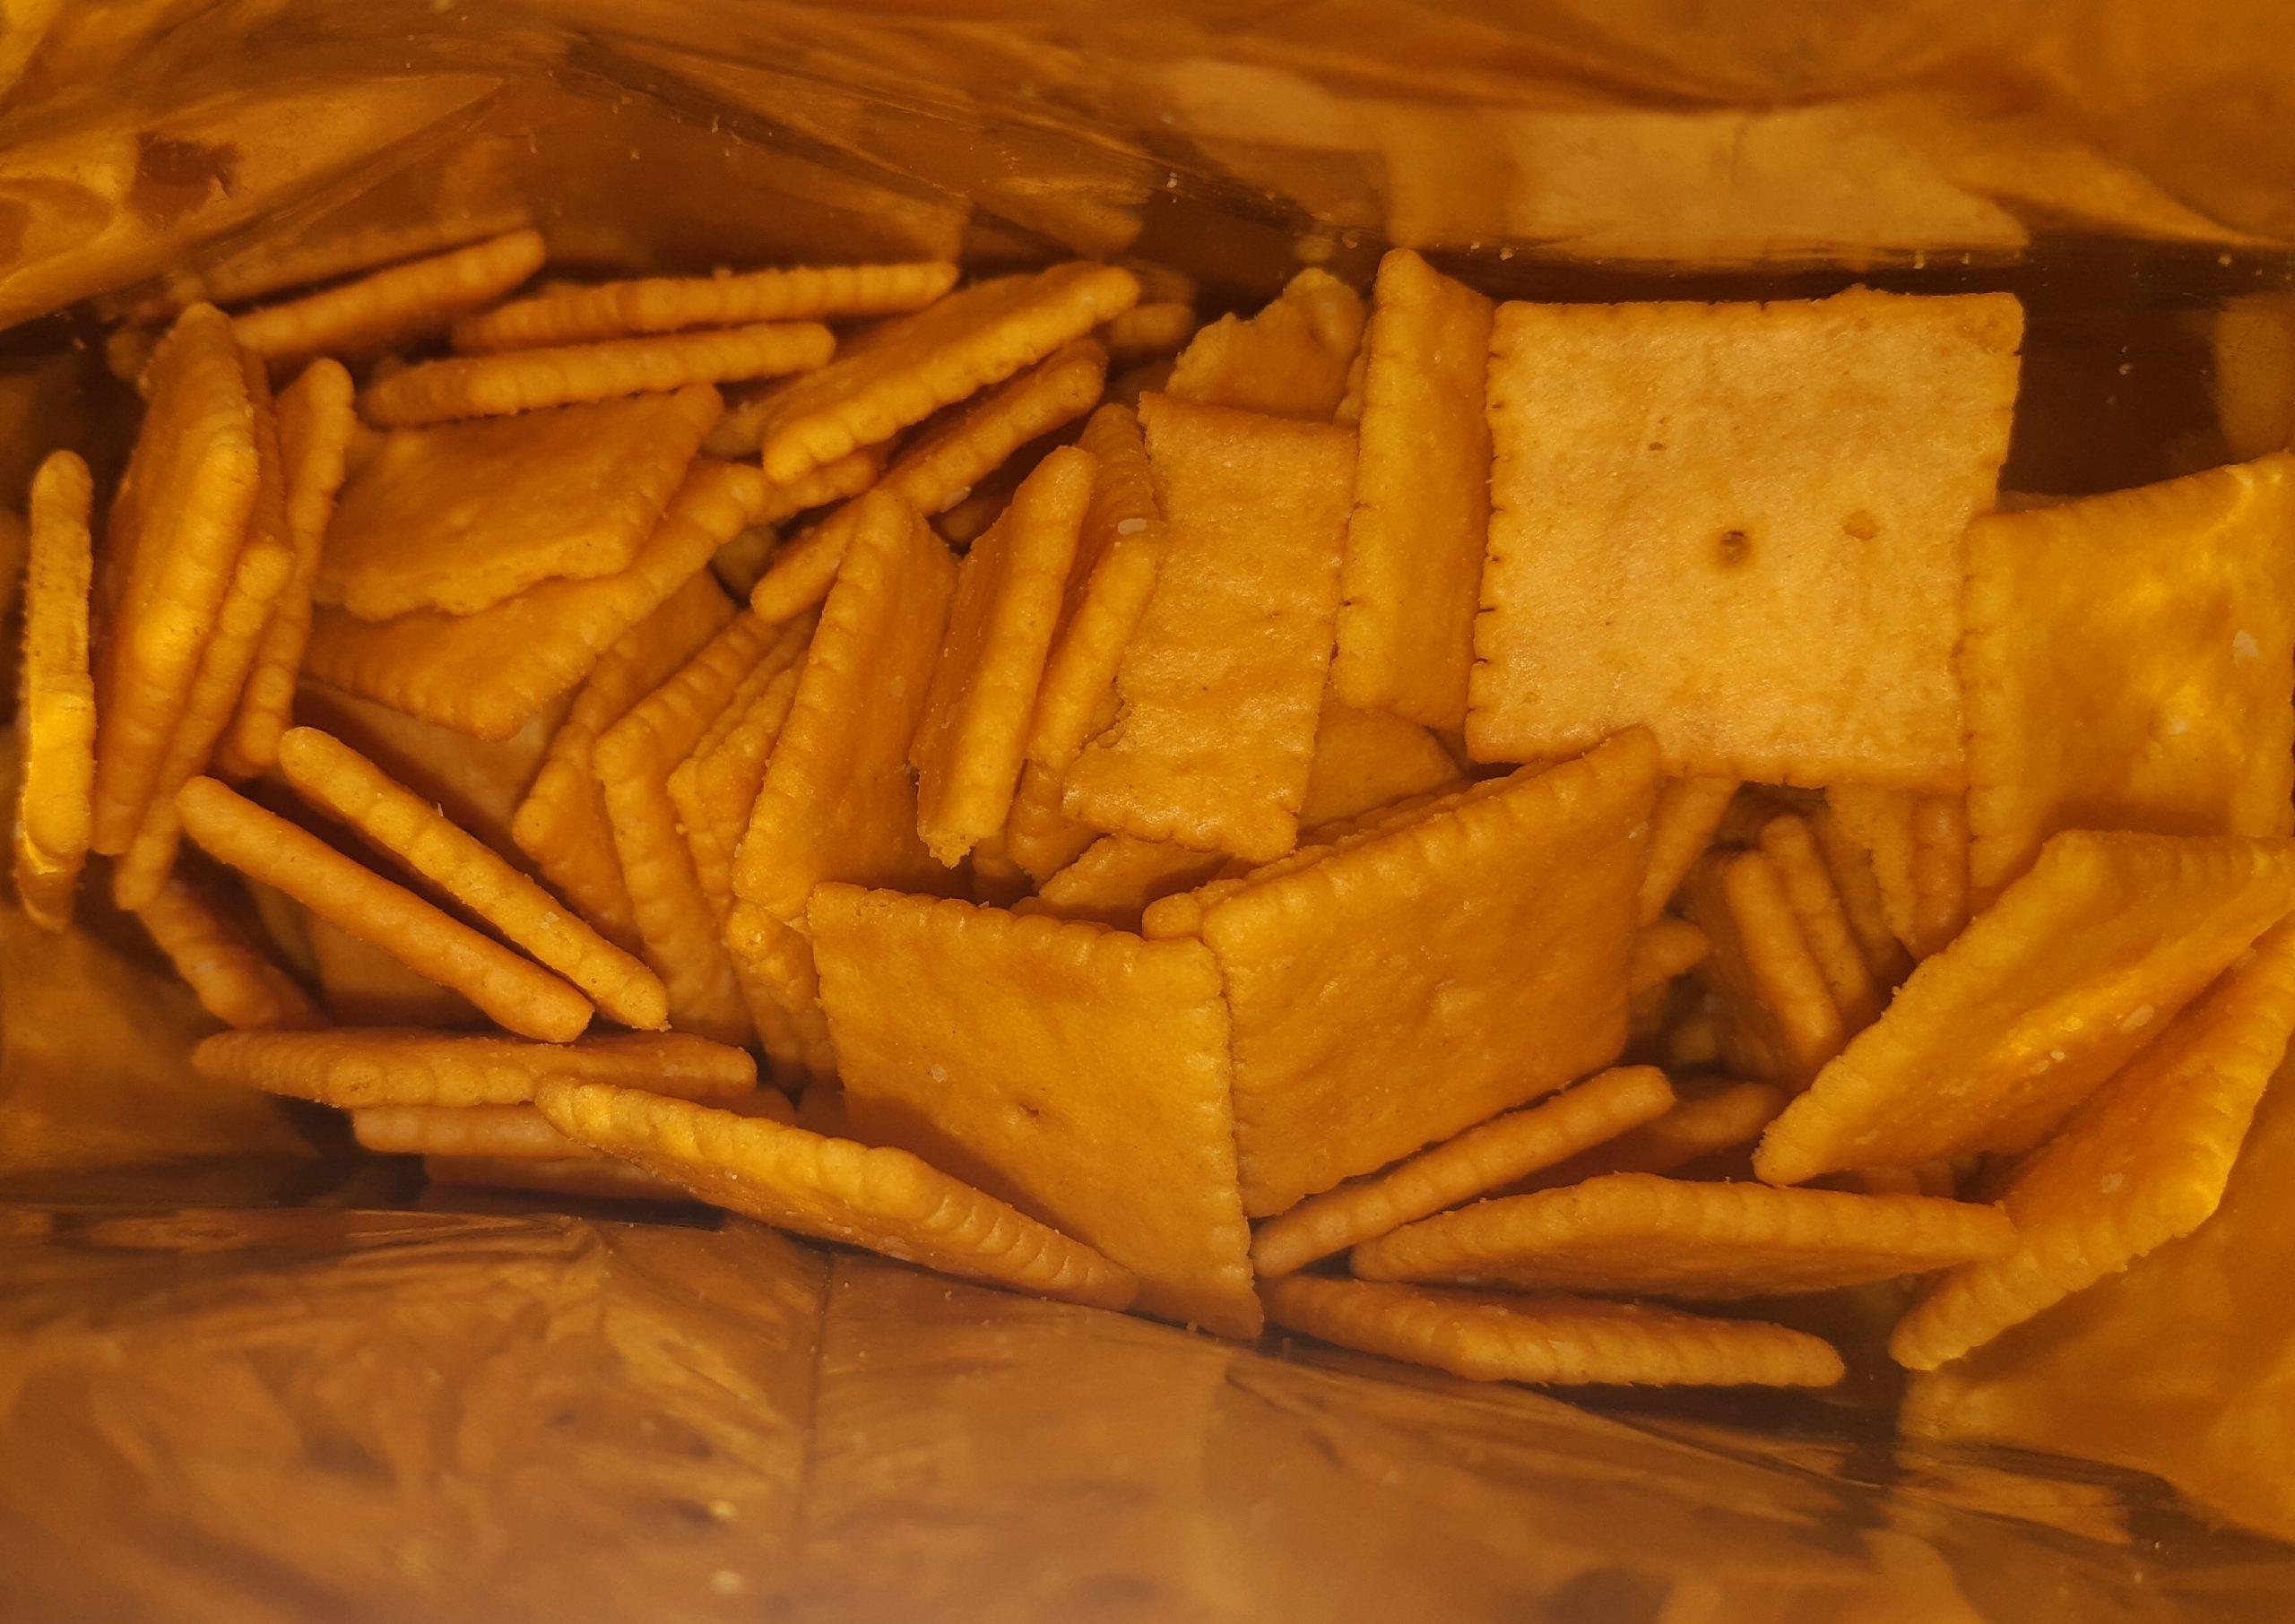 AterImber.com - The Veg Life - Product Reviews - Earth Balance Vegan Cheddar Flavoured Squares - Inside Box Picture - Earth Balance, vegan crackers, vegan cheese, cheesy crackers, vegan food, vegan food blogger, food blogger, food reviewer